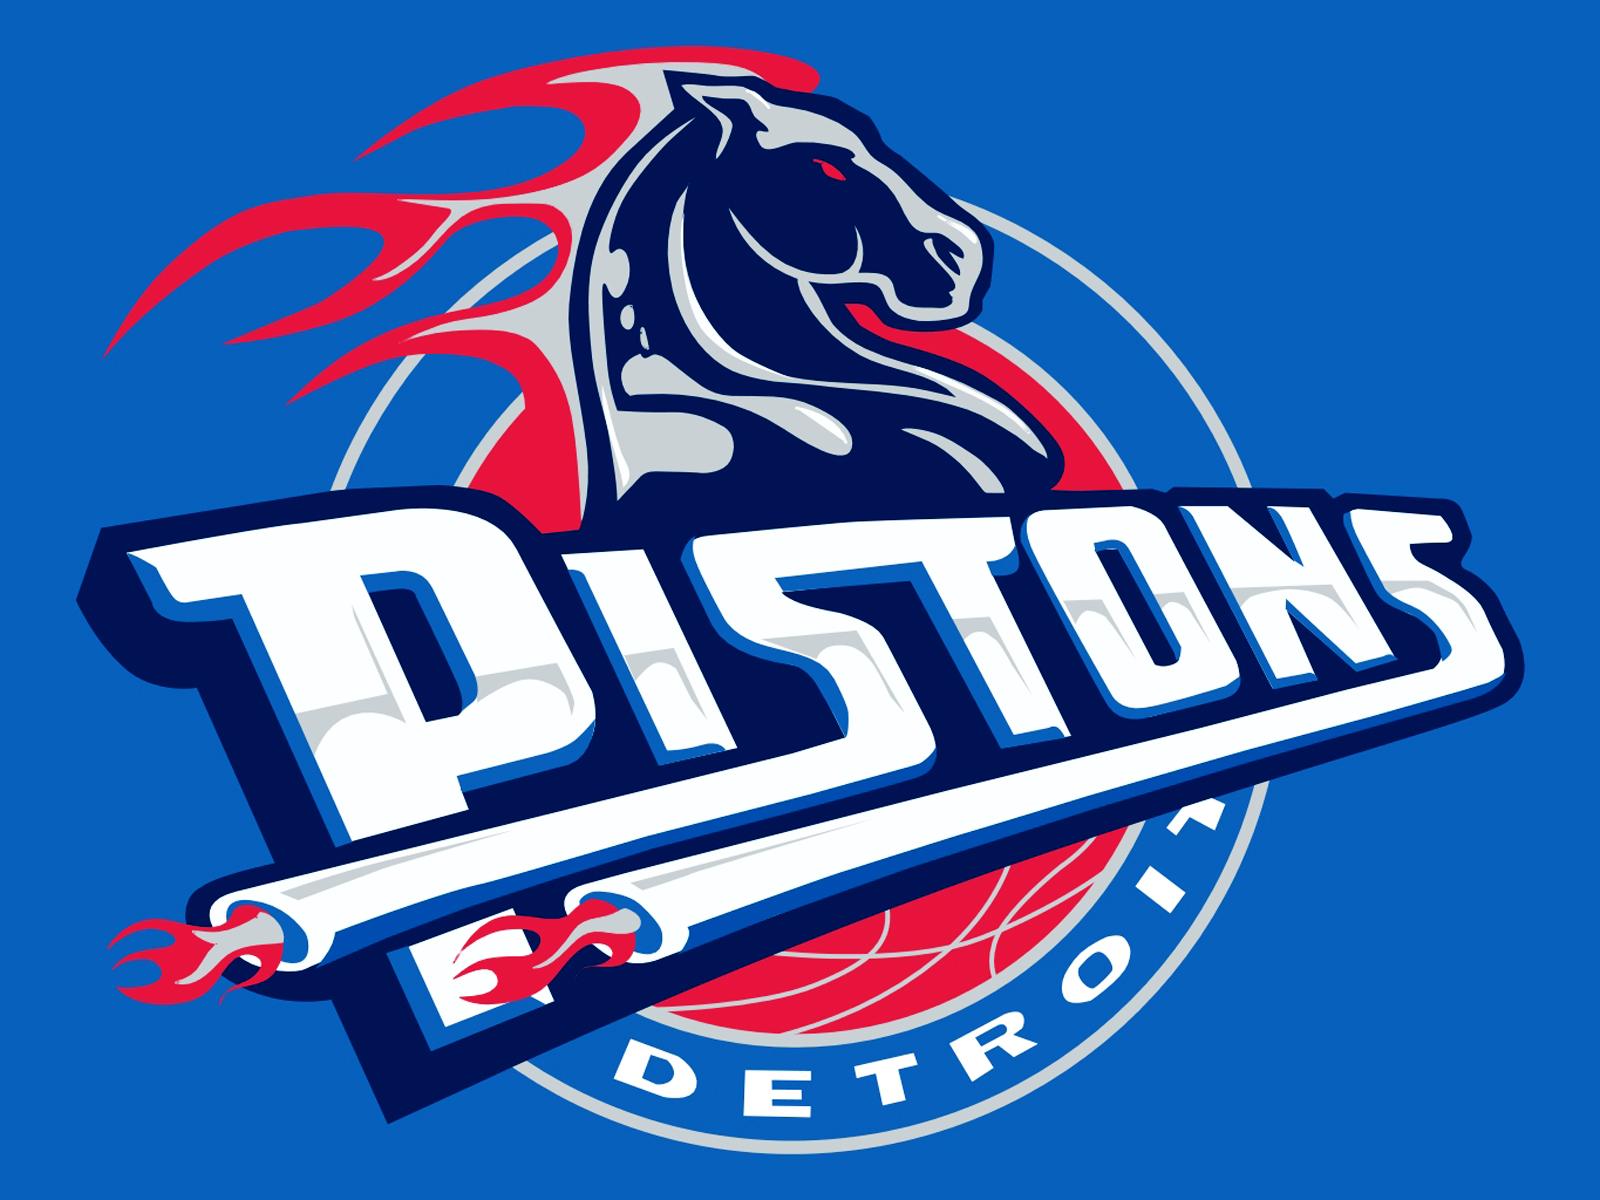 Detroit Pistons Logo Backgrounds.